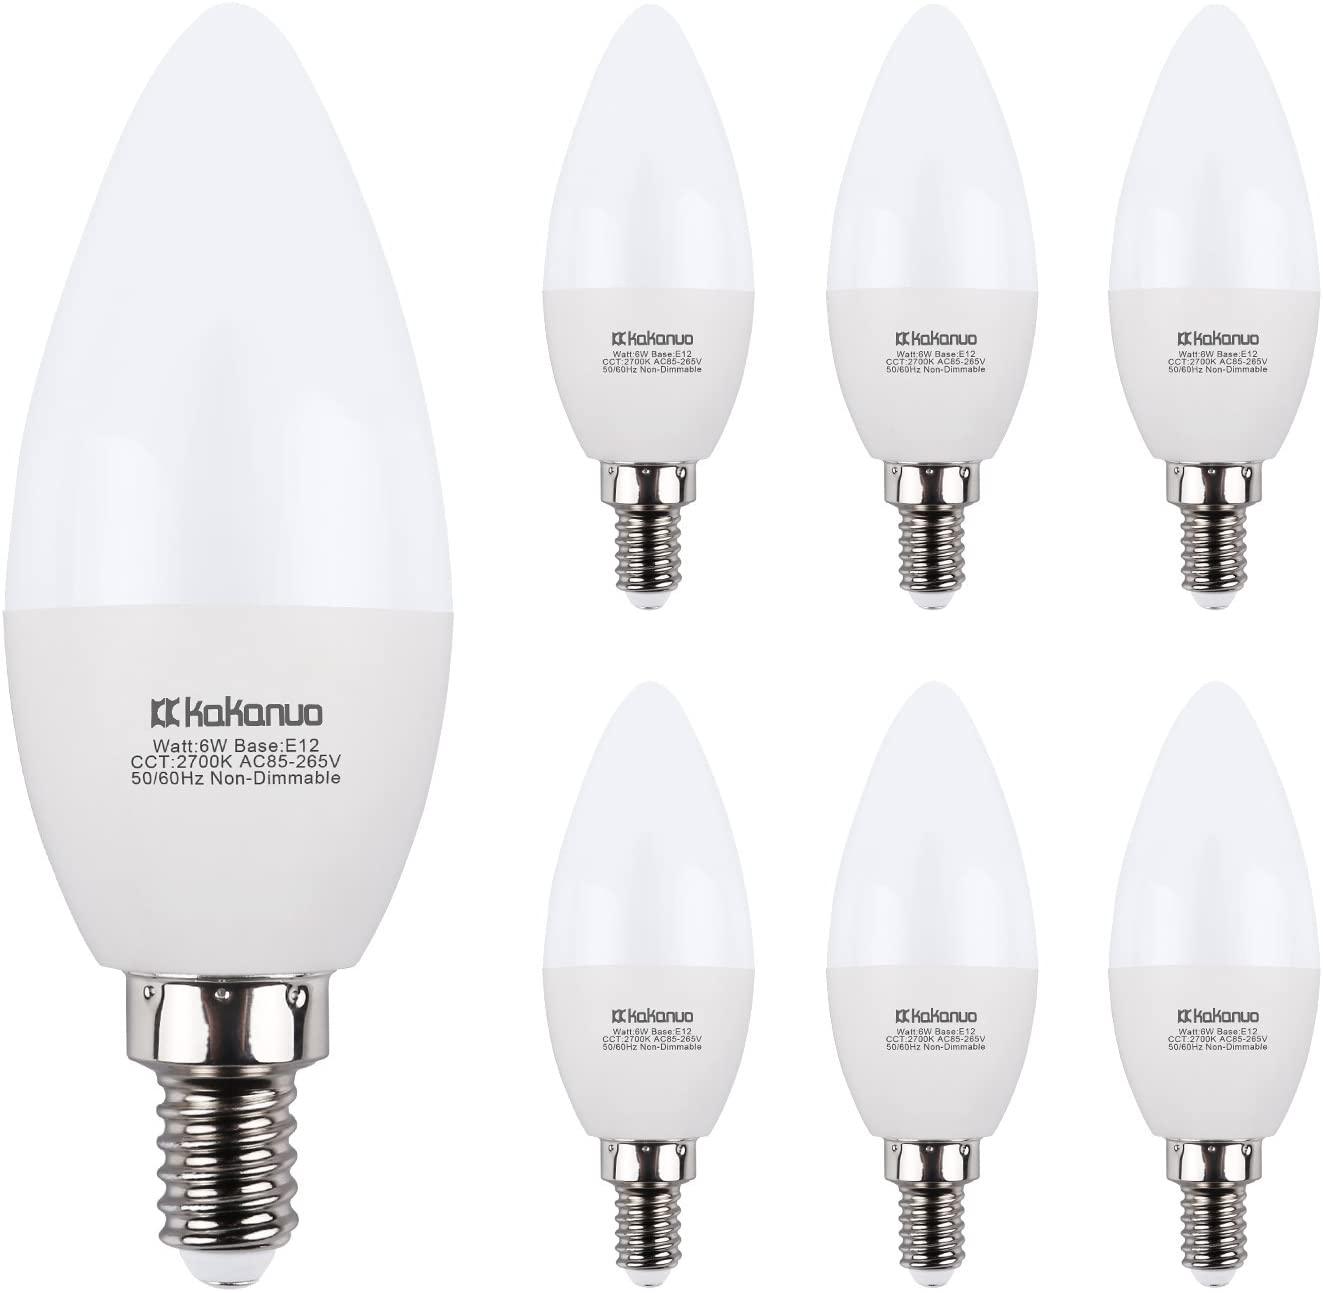 LED Candelabra Bulbs Kakanuo 6W Replace 60W E12 Base Chandelier Bulbs, Warm White 2700K B11 Led Candle Light Bulbs, Pack of 6